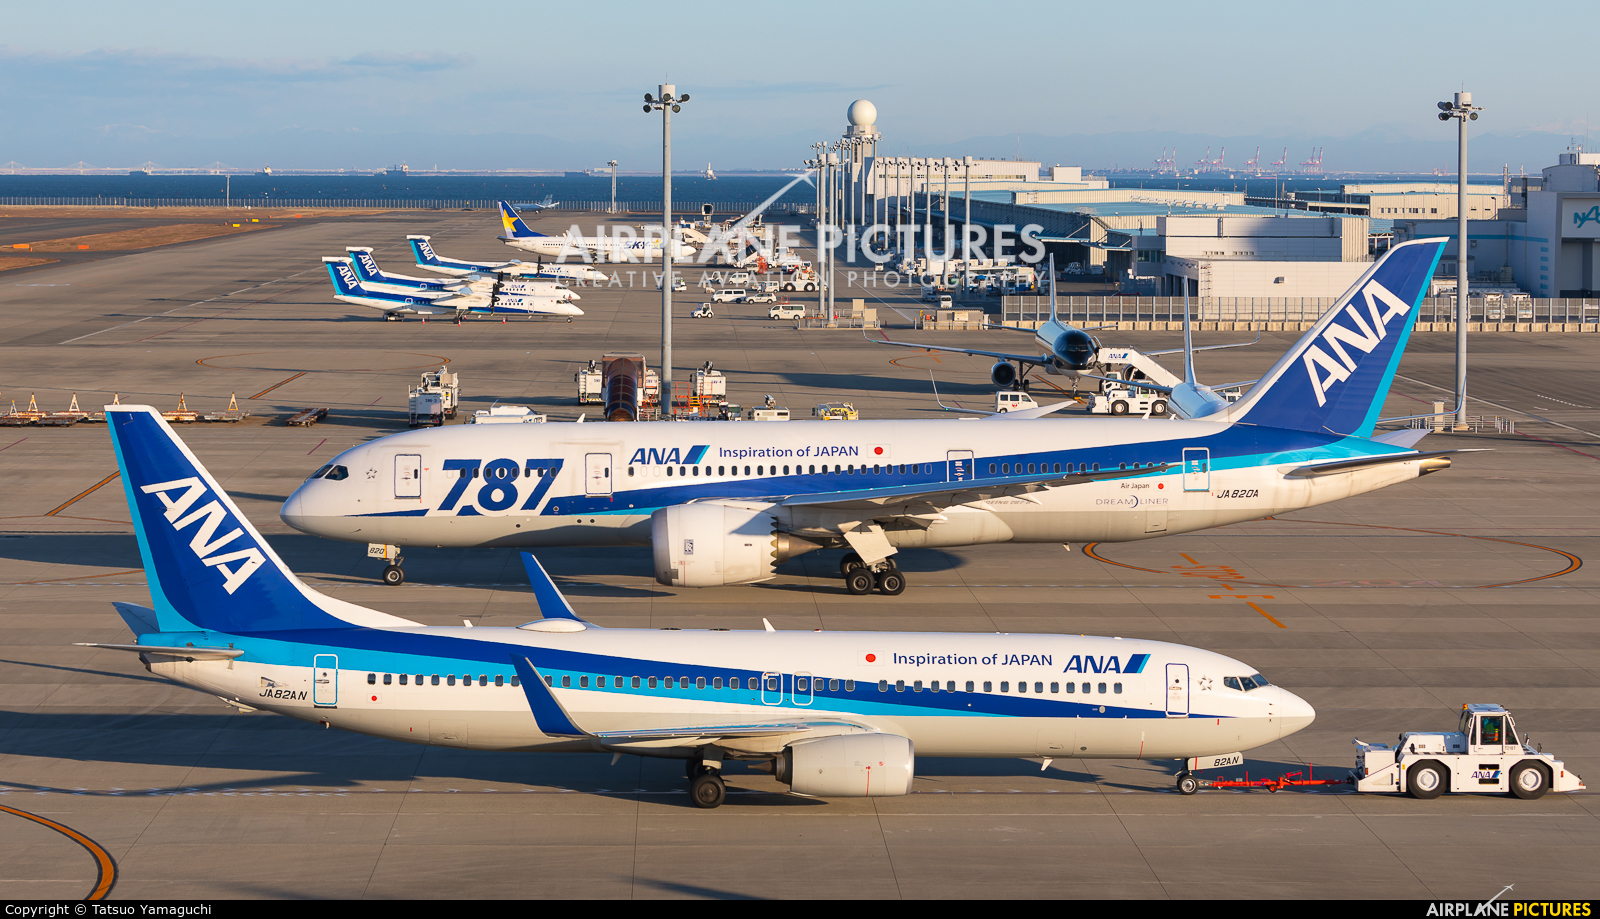 ANA - All Nippon Airways JA820A aircraft at Chubu Centrair Intl